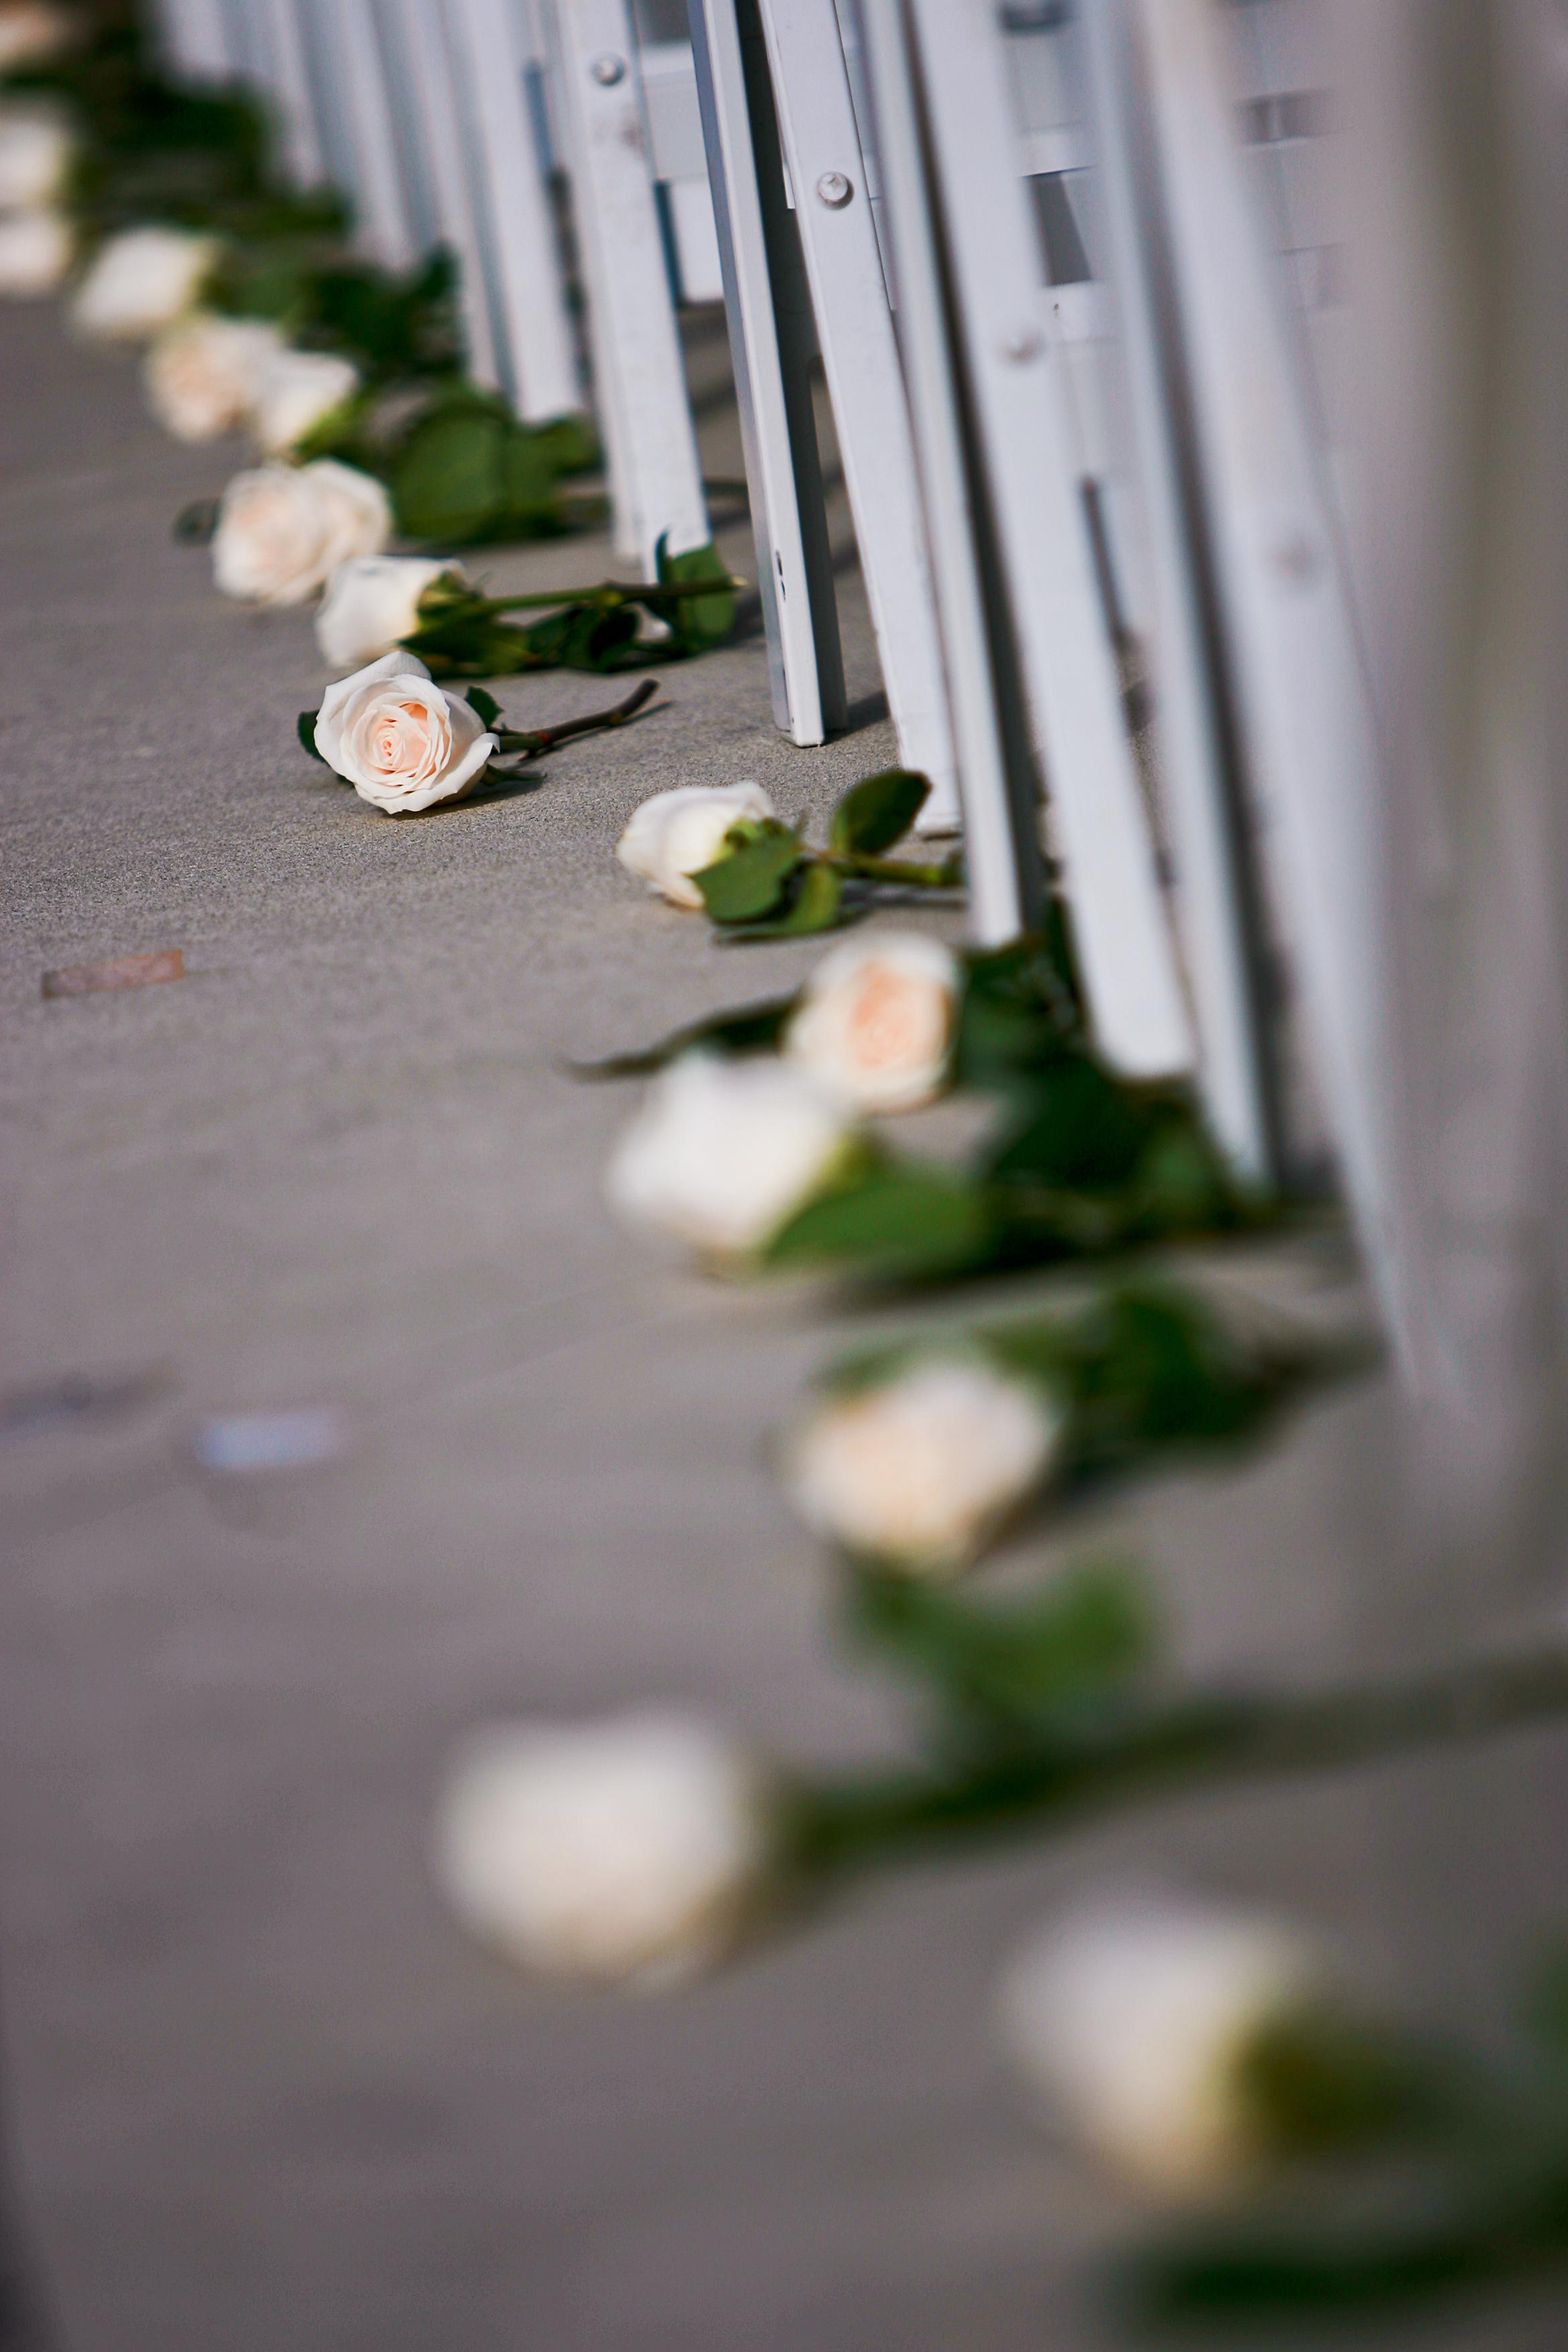 Ceremony, Flowers & Decor, white, green, black, Ceremony Flowers, Aisle Decor, Flowers, Aisle